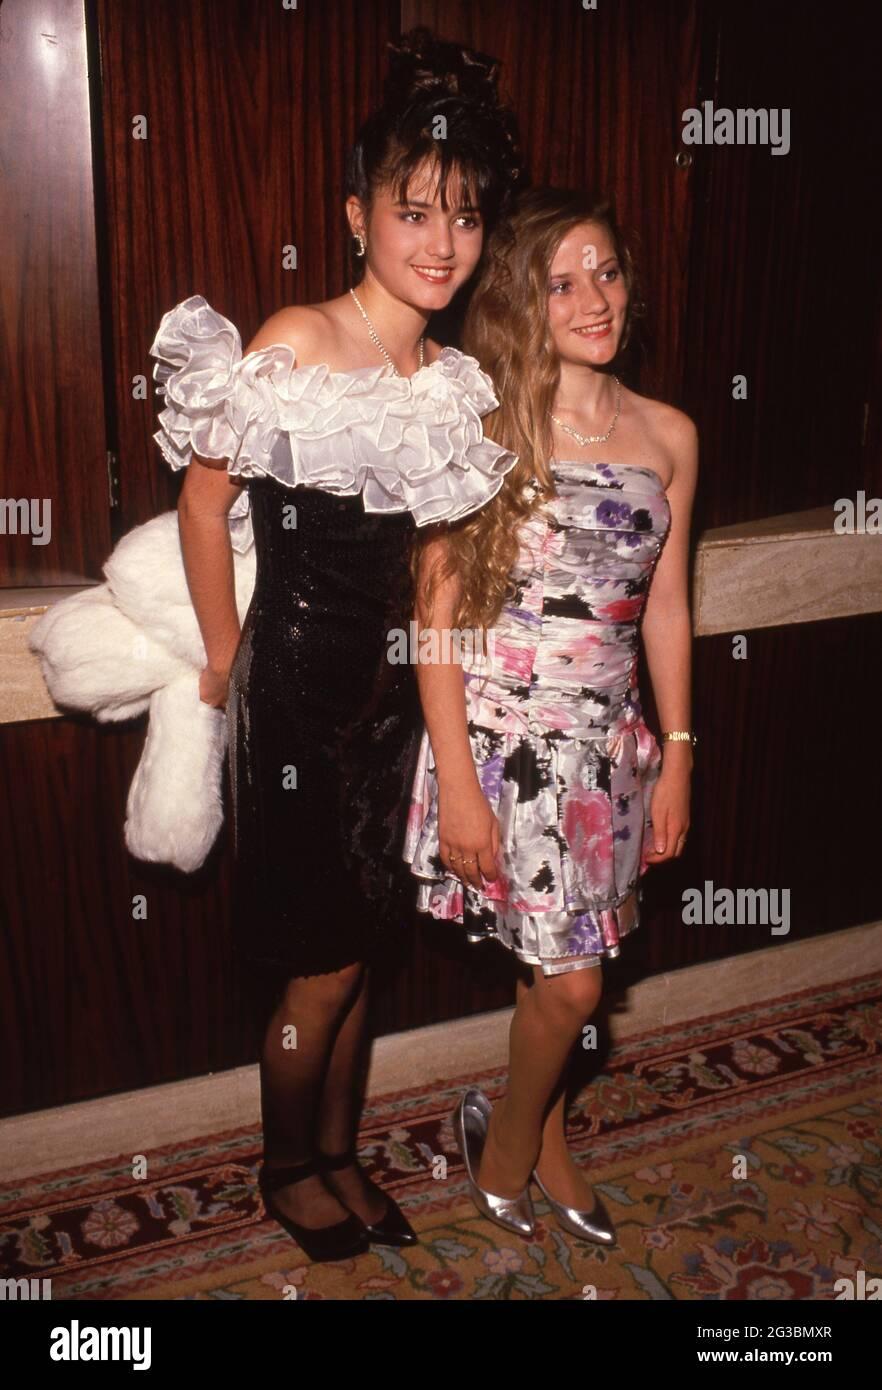 Danica McKellar et Crystal McKellar Circa années 80 crédit: Ralph Dominguez/MediaPunch Banque D'Images